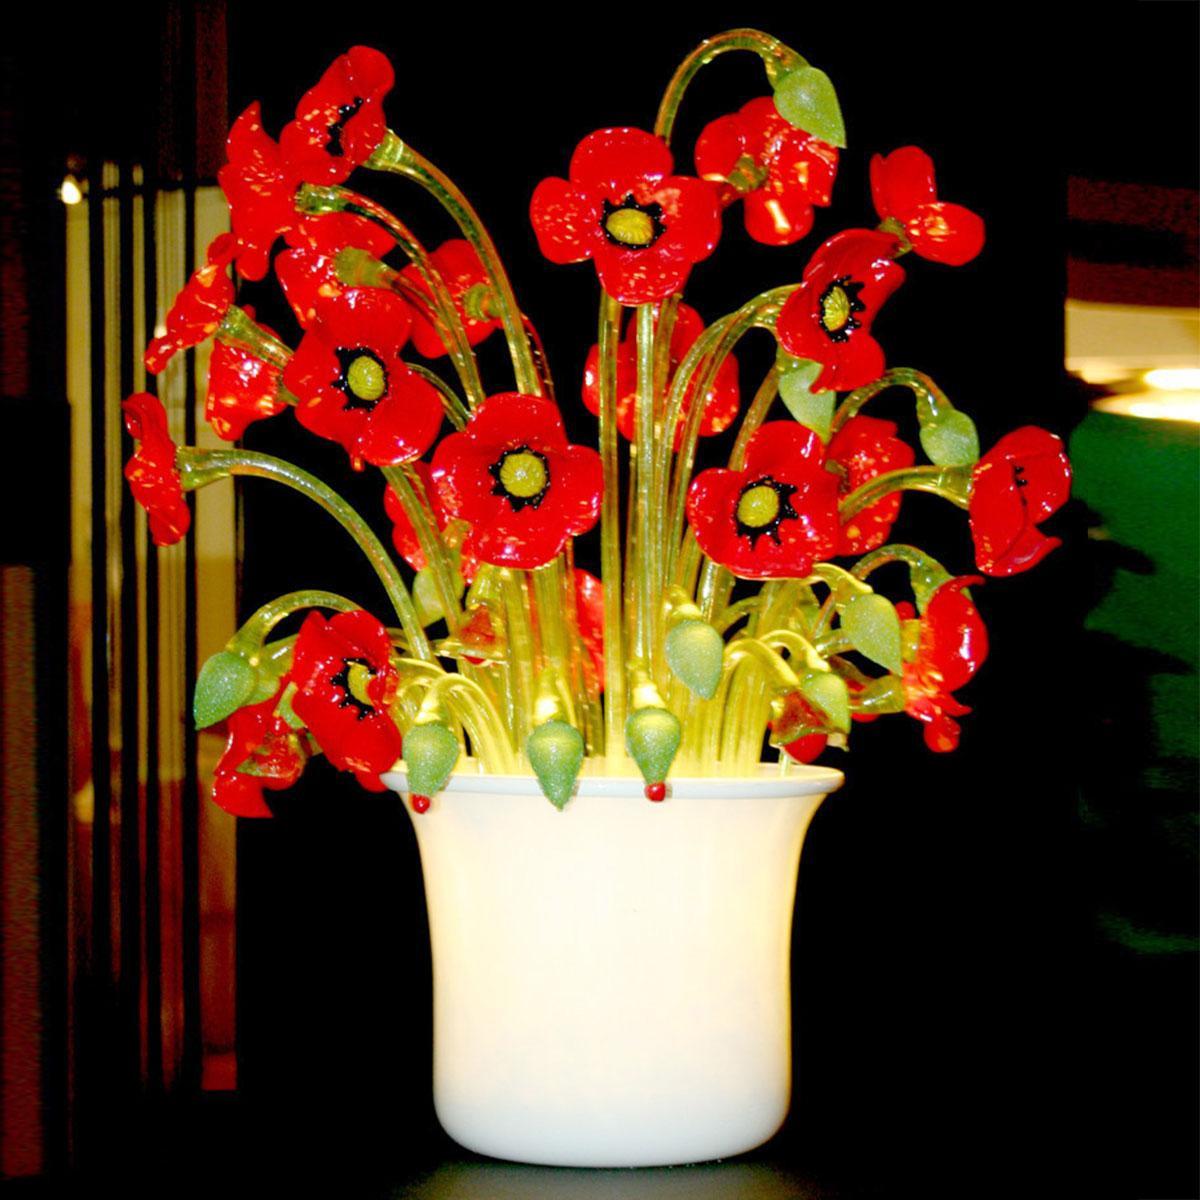 """Vaso di Papaveri"" lampara de sobremesa de Murano - 1 luce - rojo"